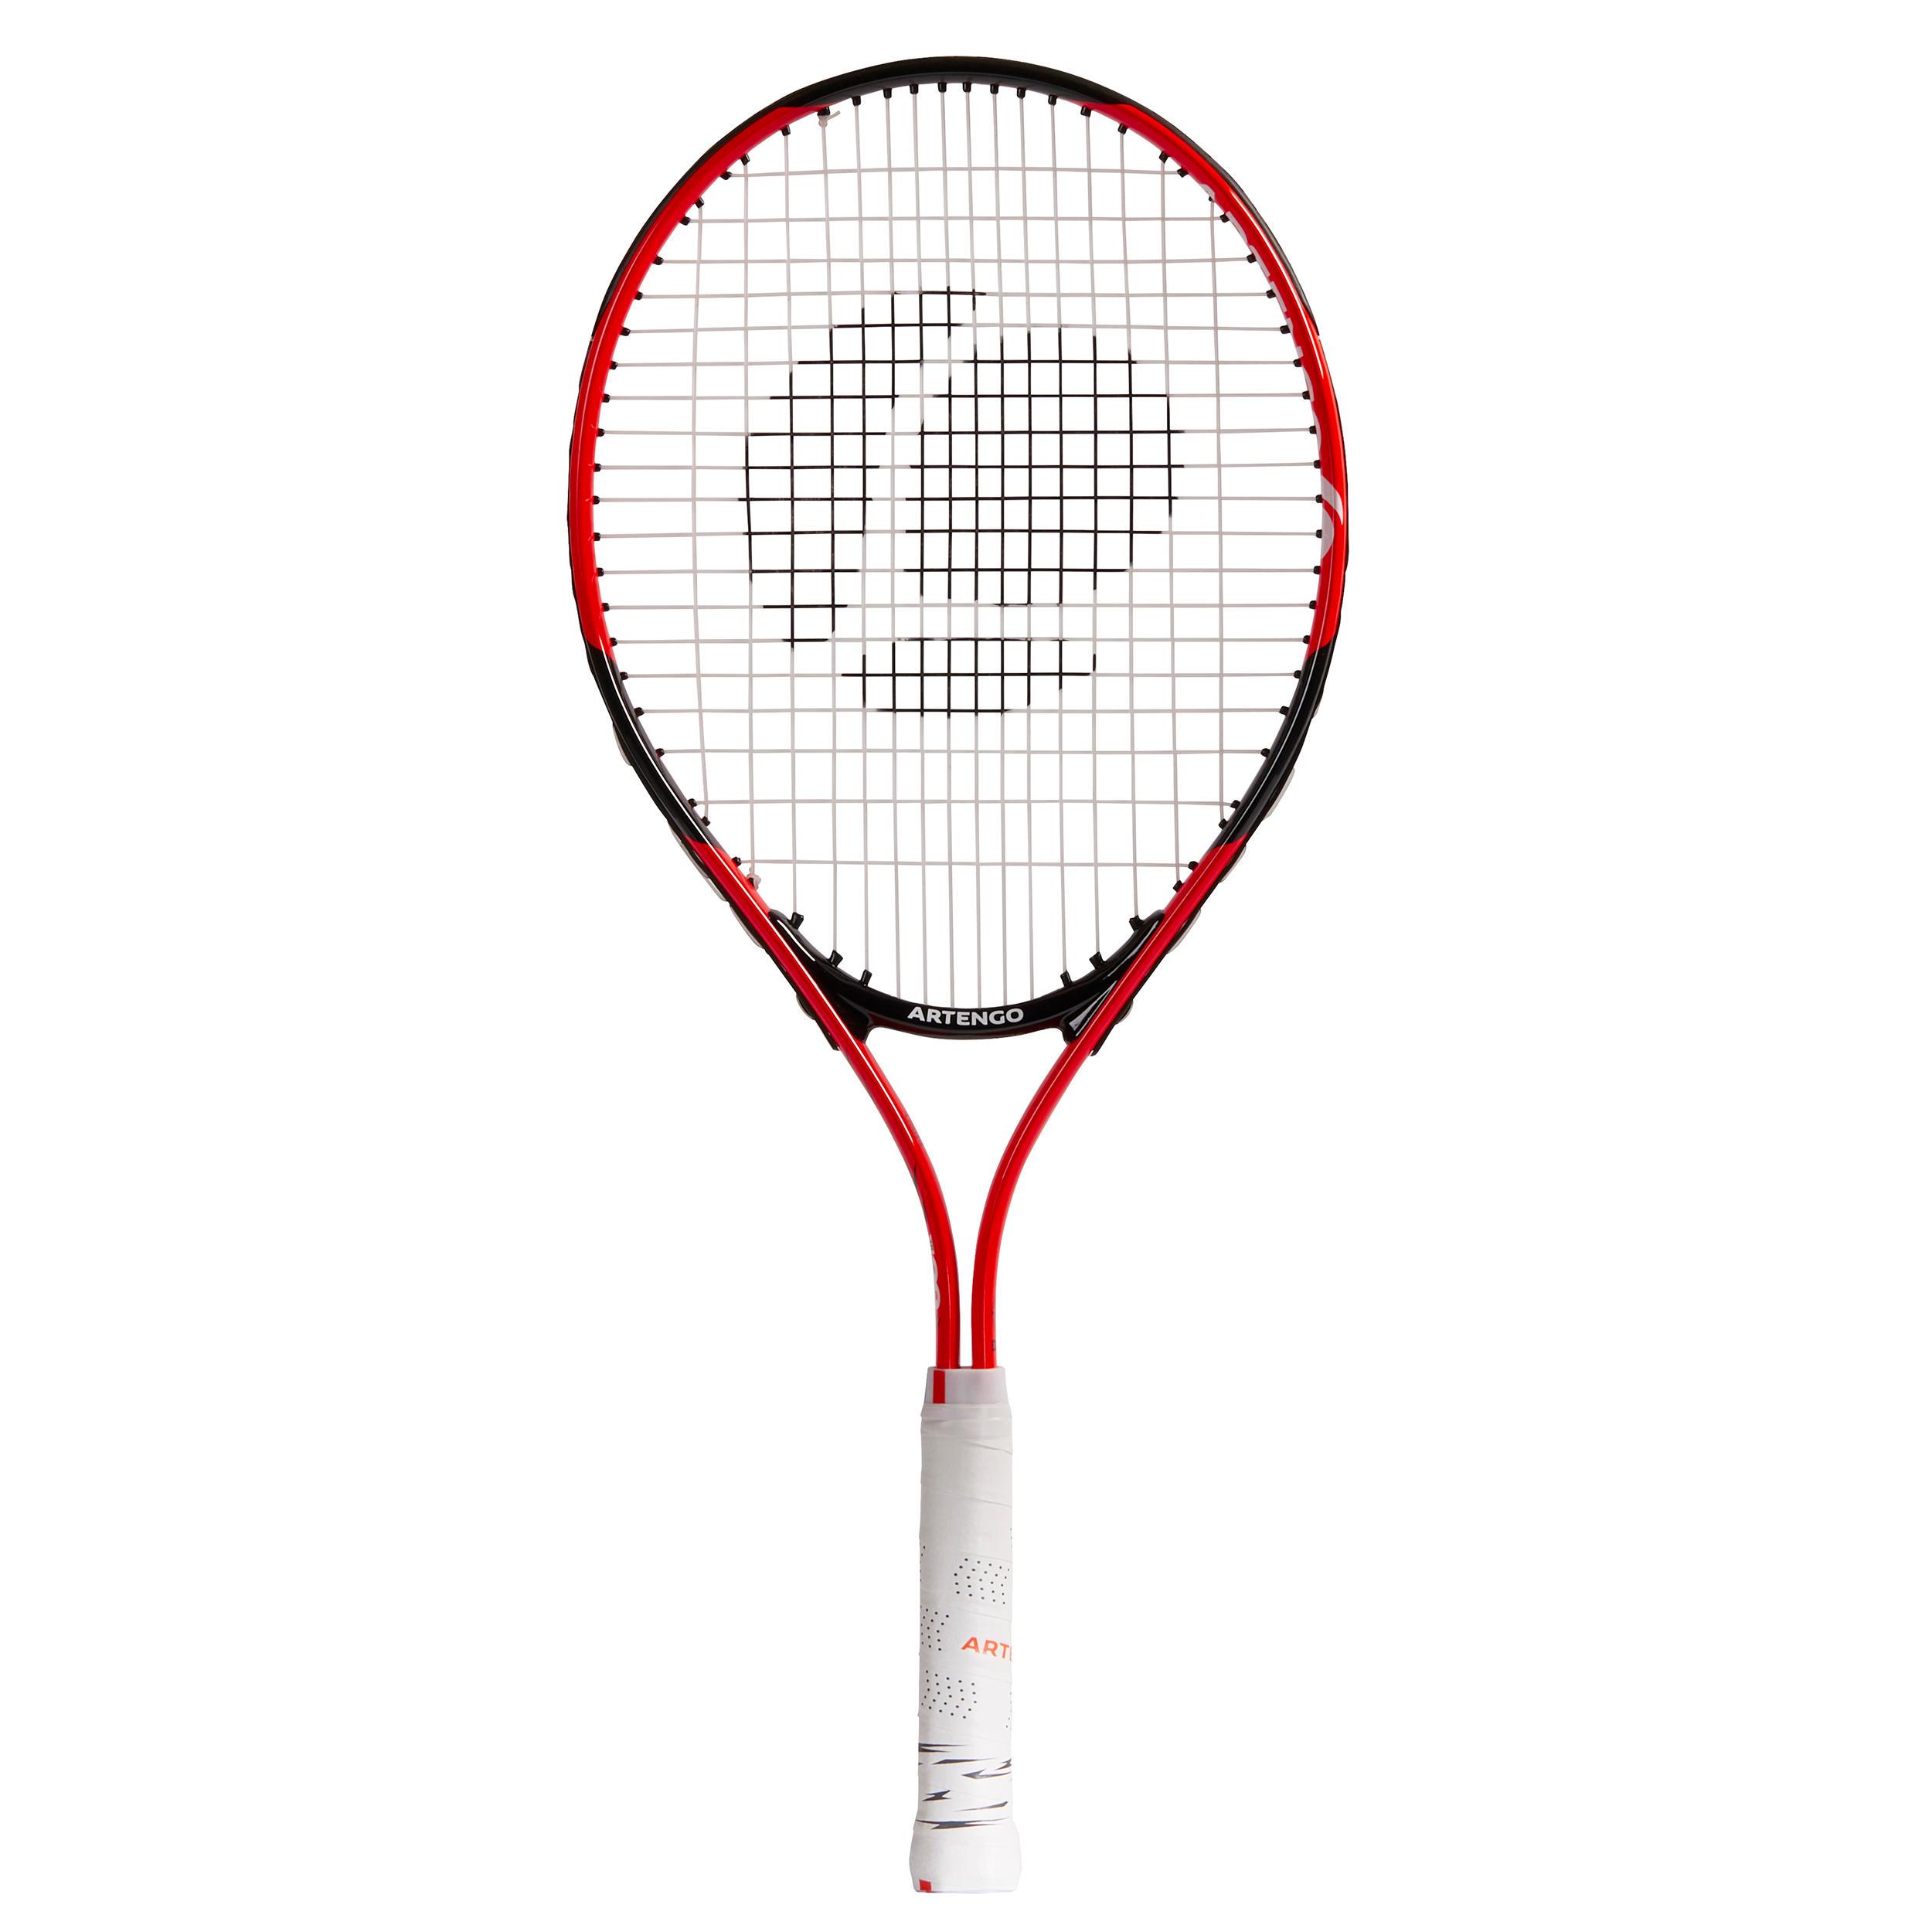 Rachetă Tenis TR130 M25 Copii